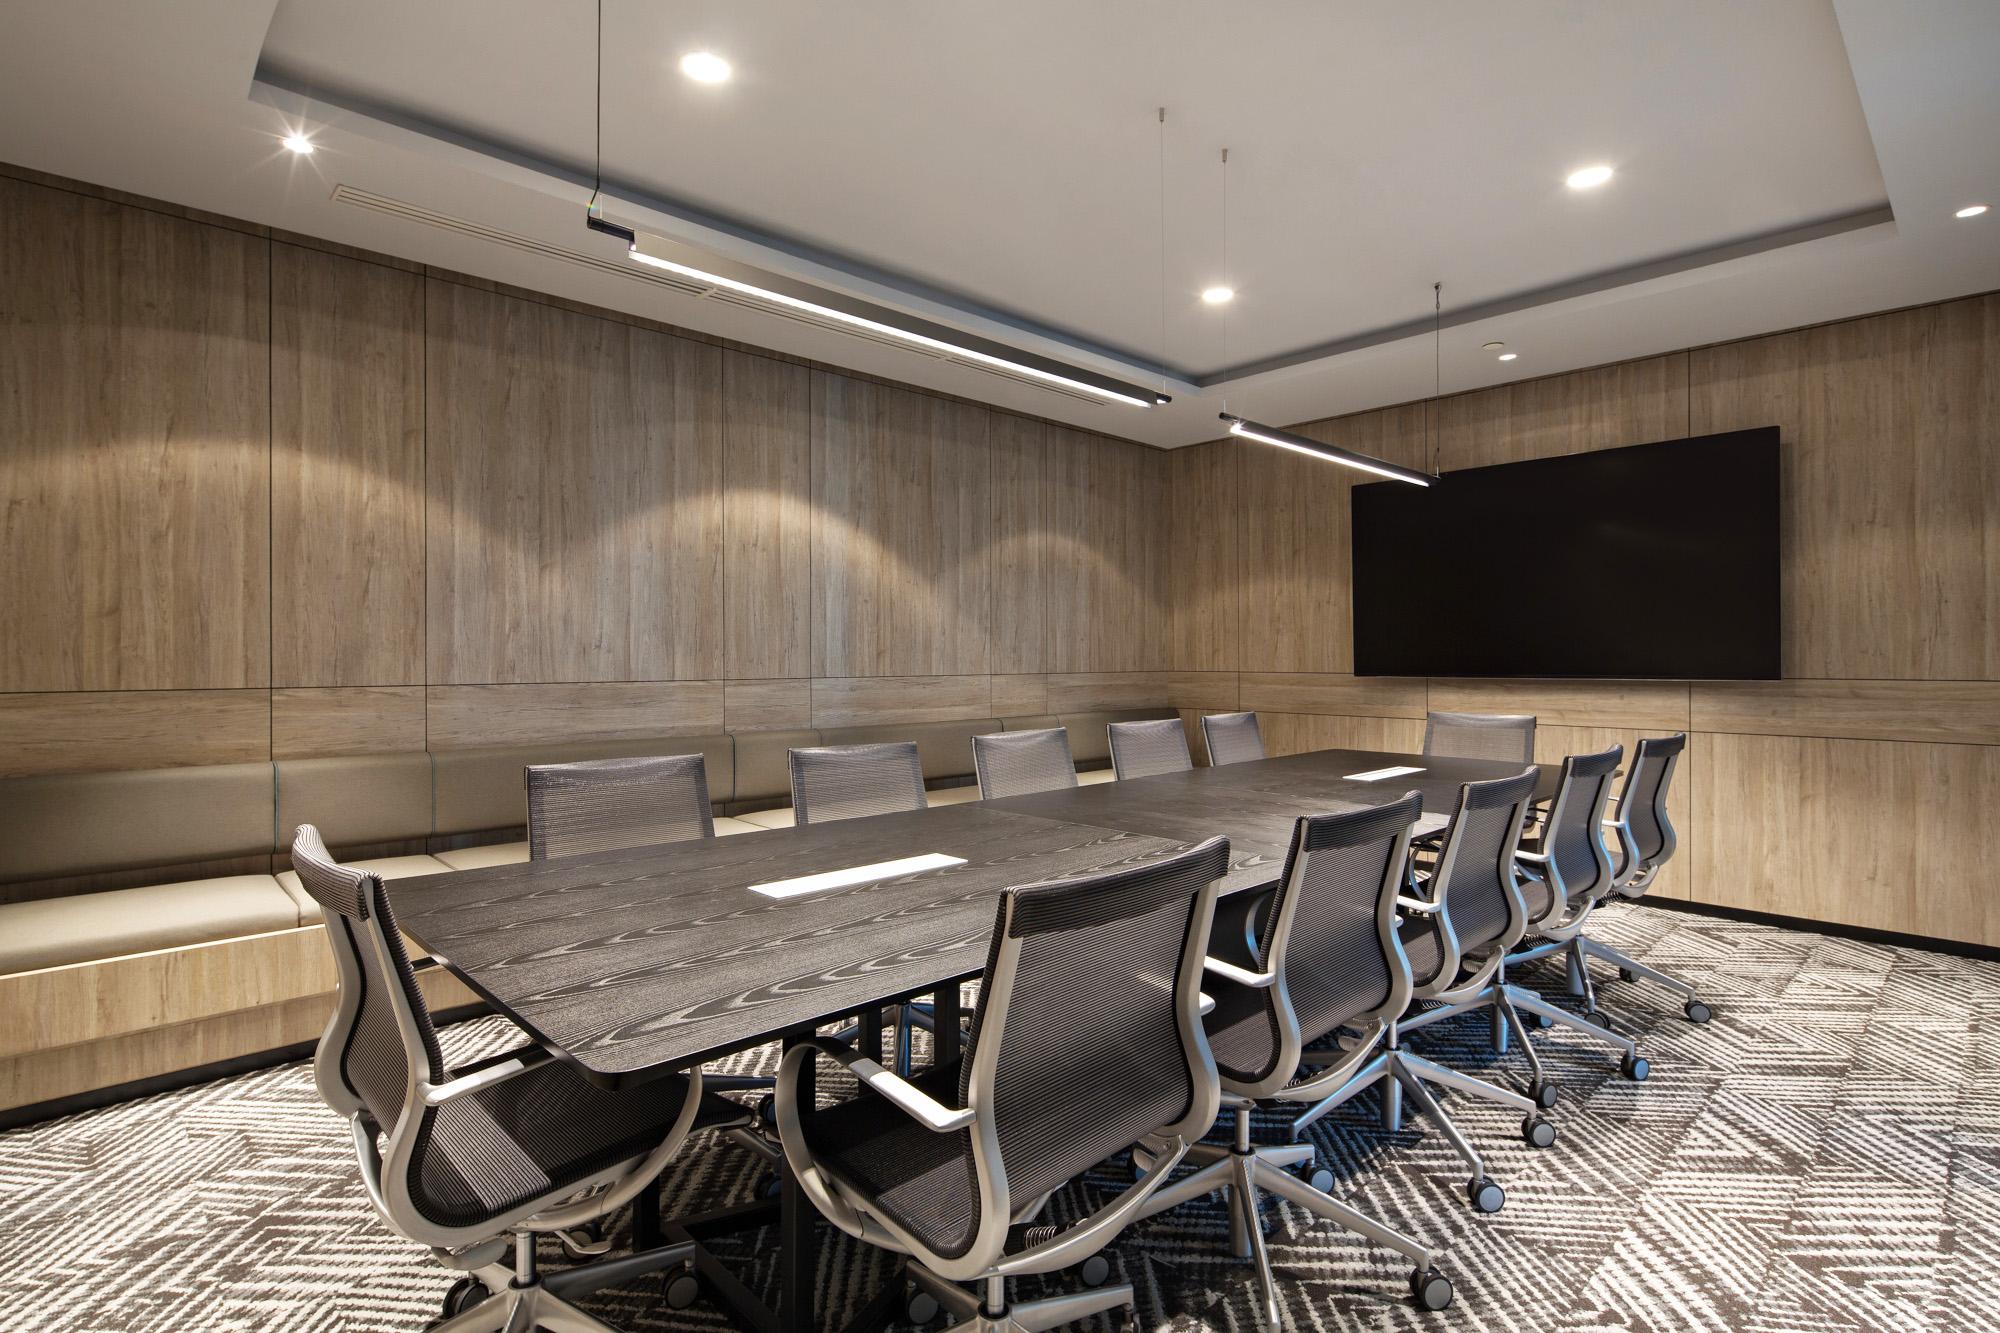 03 ADT Conference Room by Studio Piu.jpg